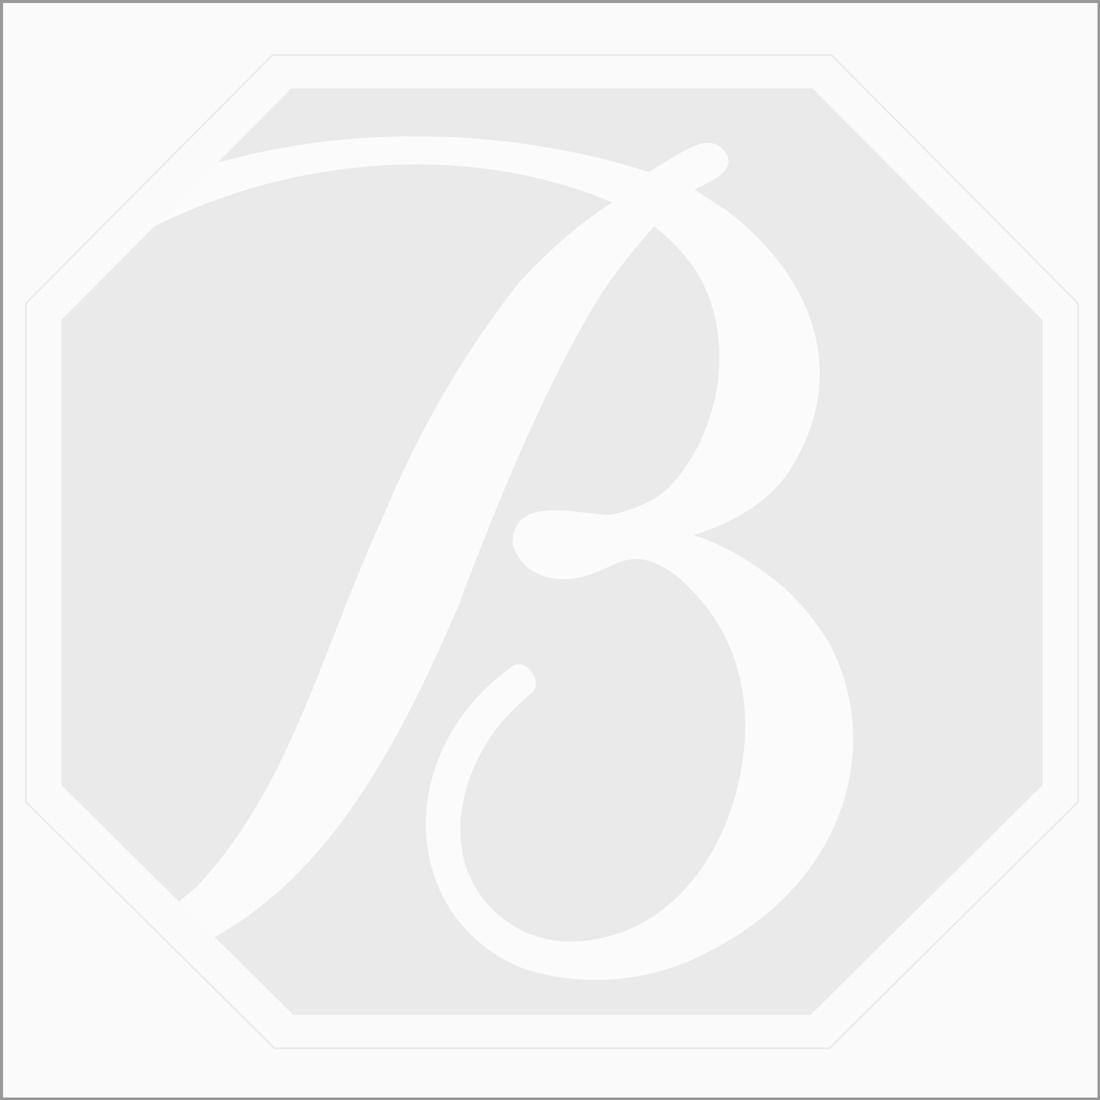 2 Black Diamond Oval Shape Rose Cut Diamonds - 2.81 cts. (DRC1273)